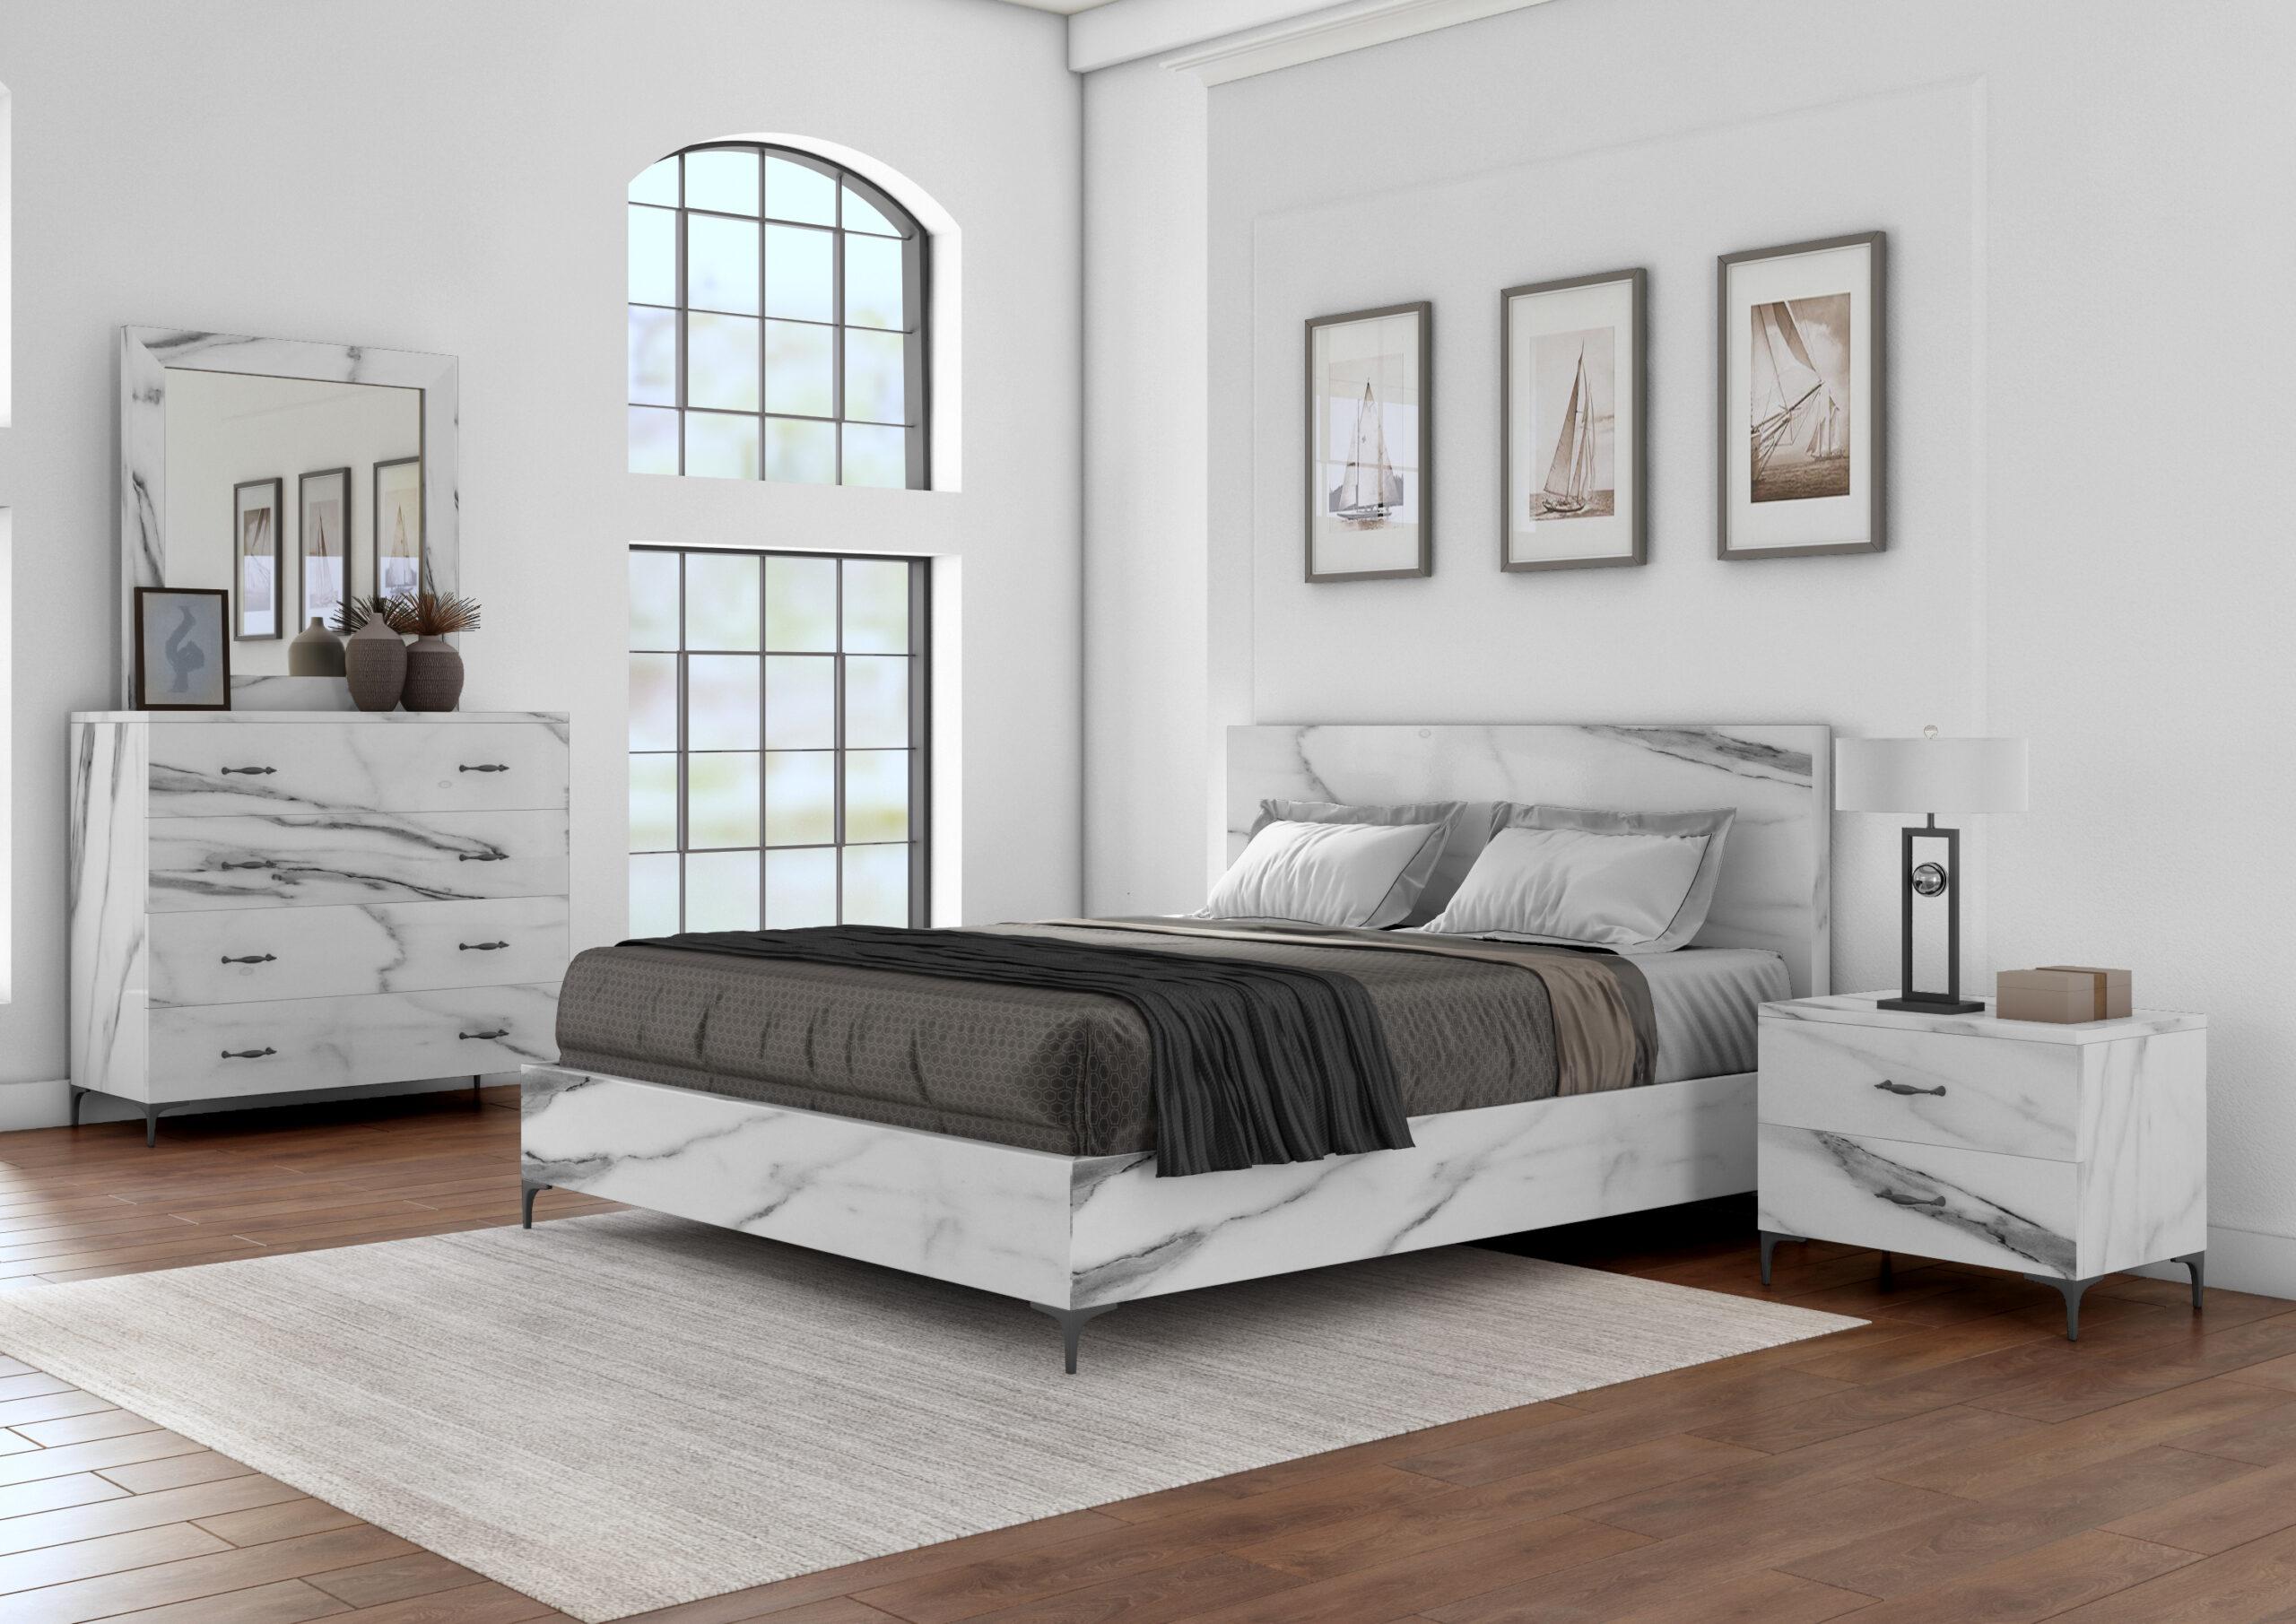 חדר שינה איילון